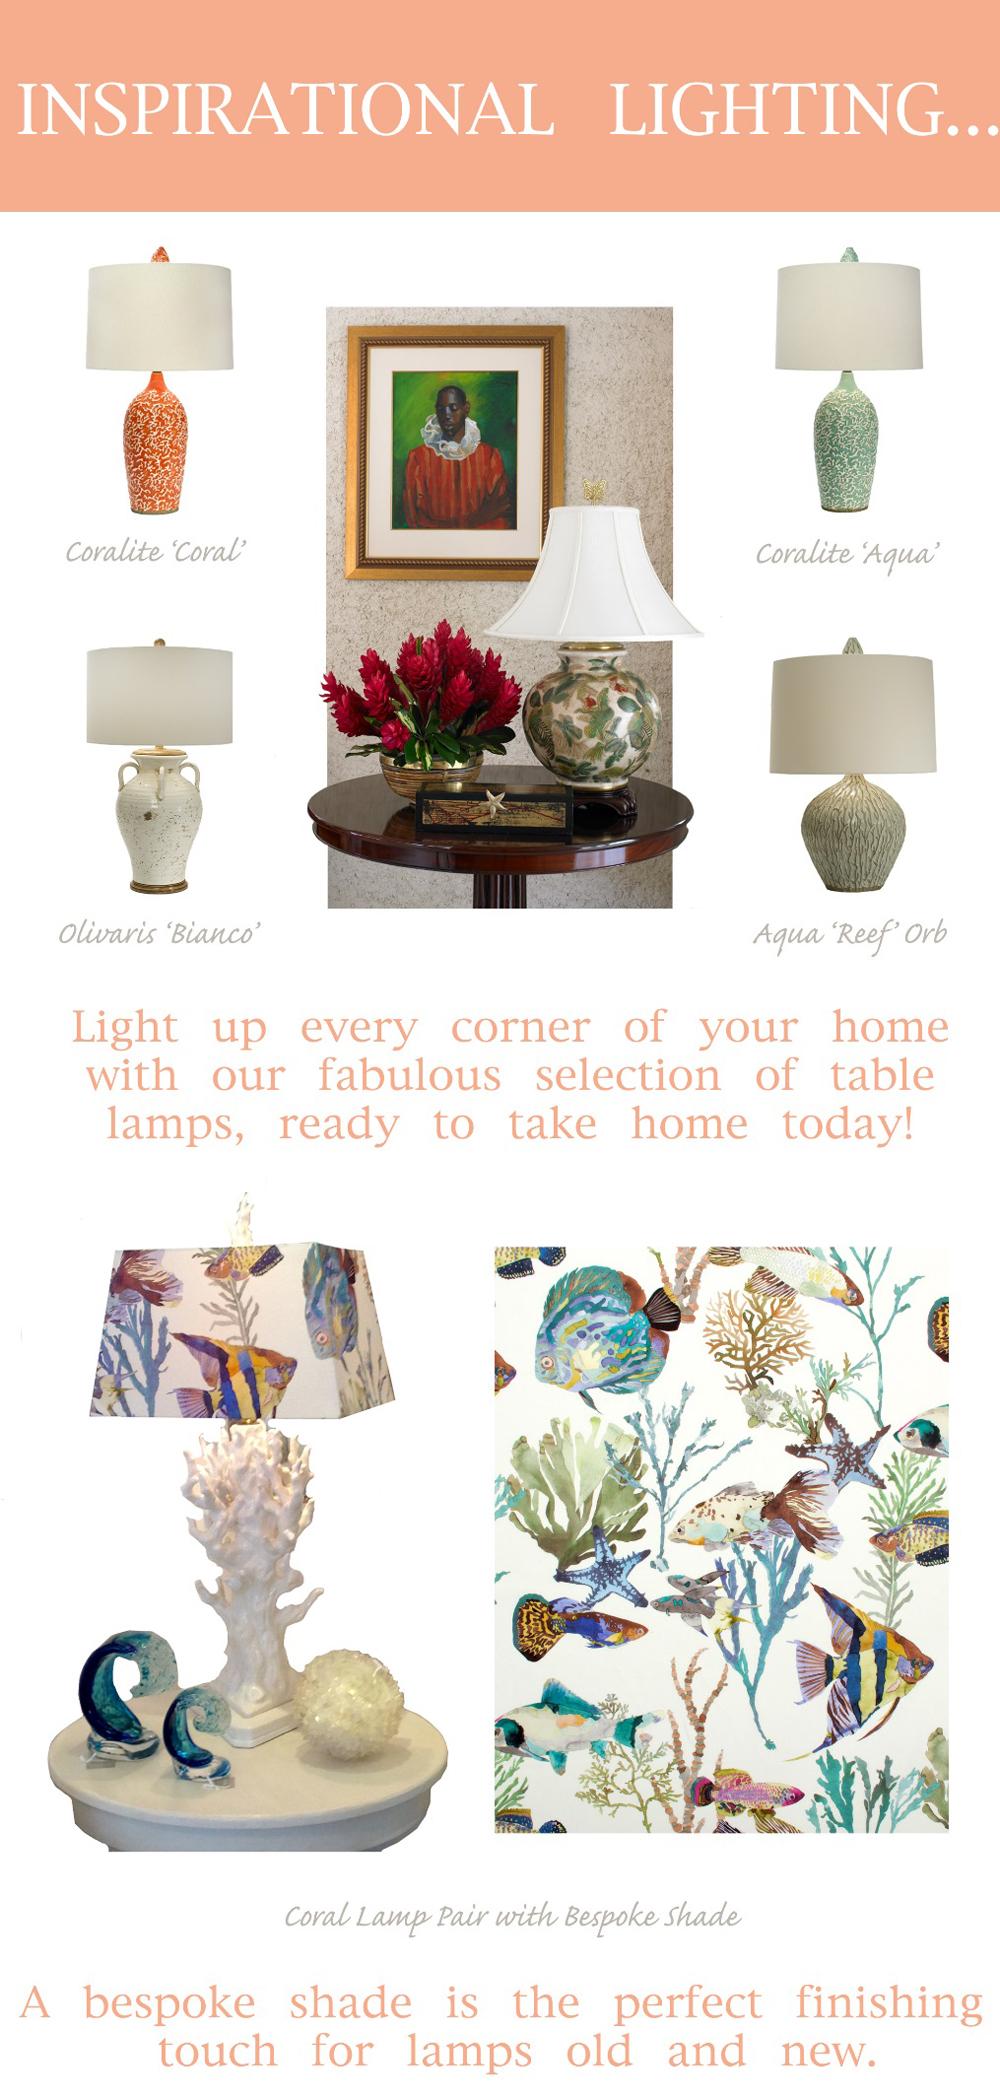 Jenny Blanc Blog - Inspirational Lighting